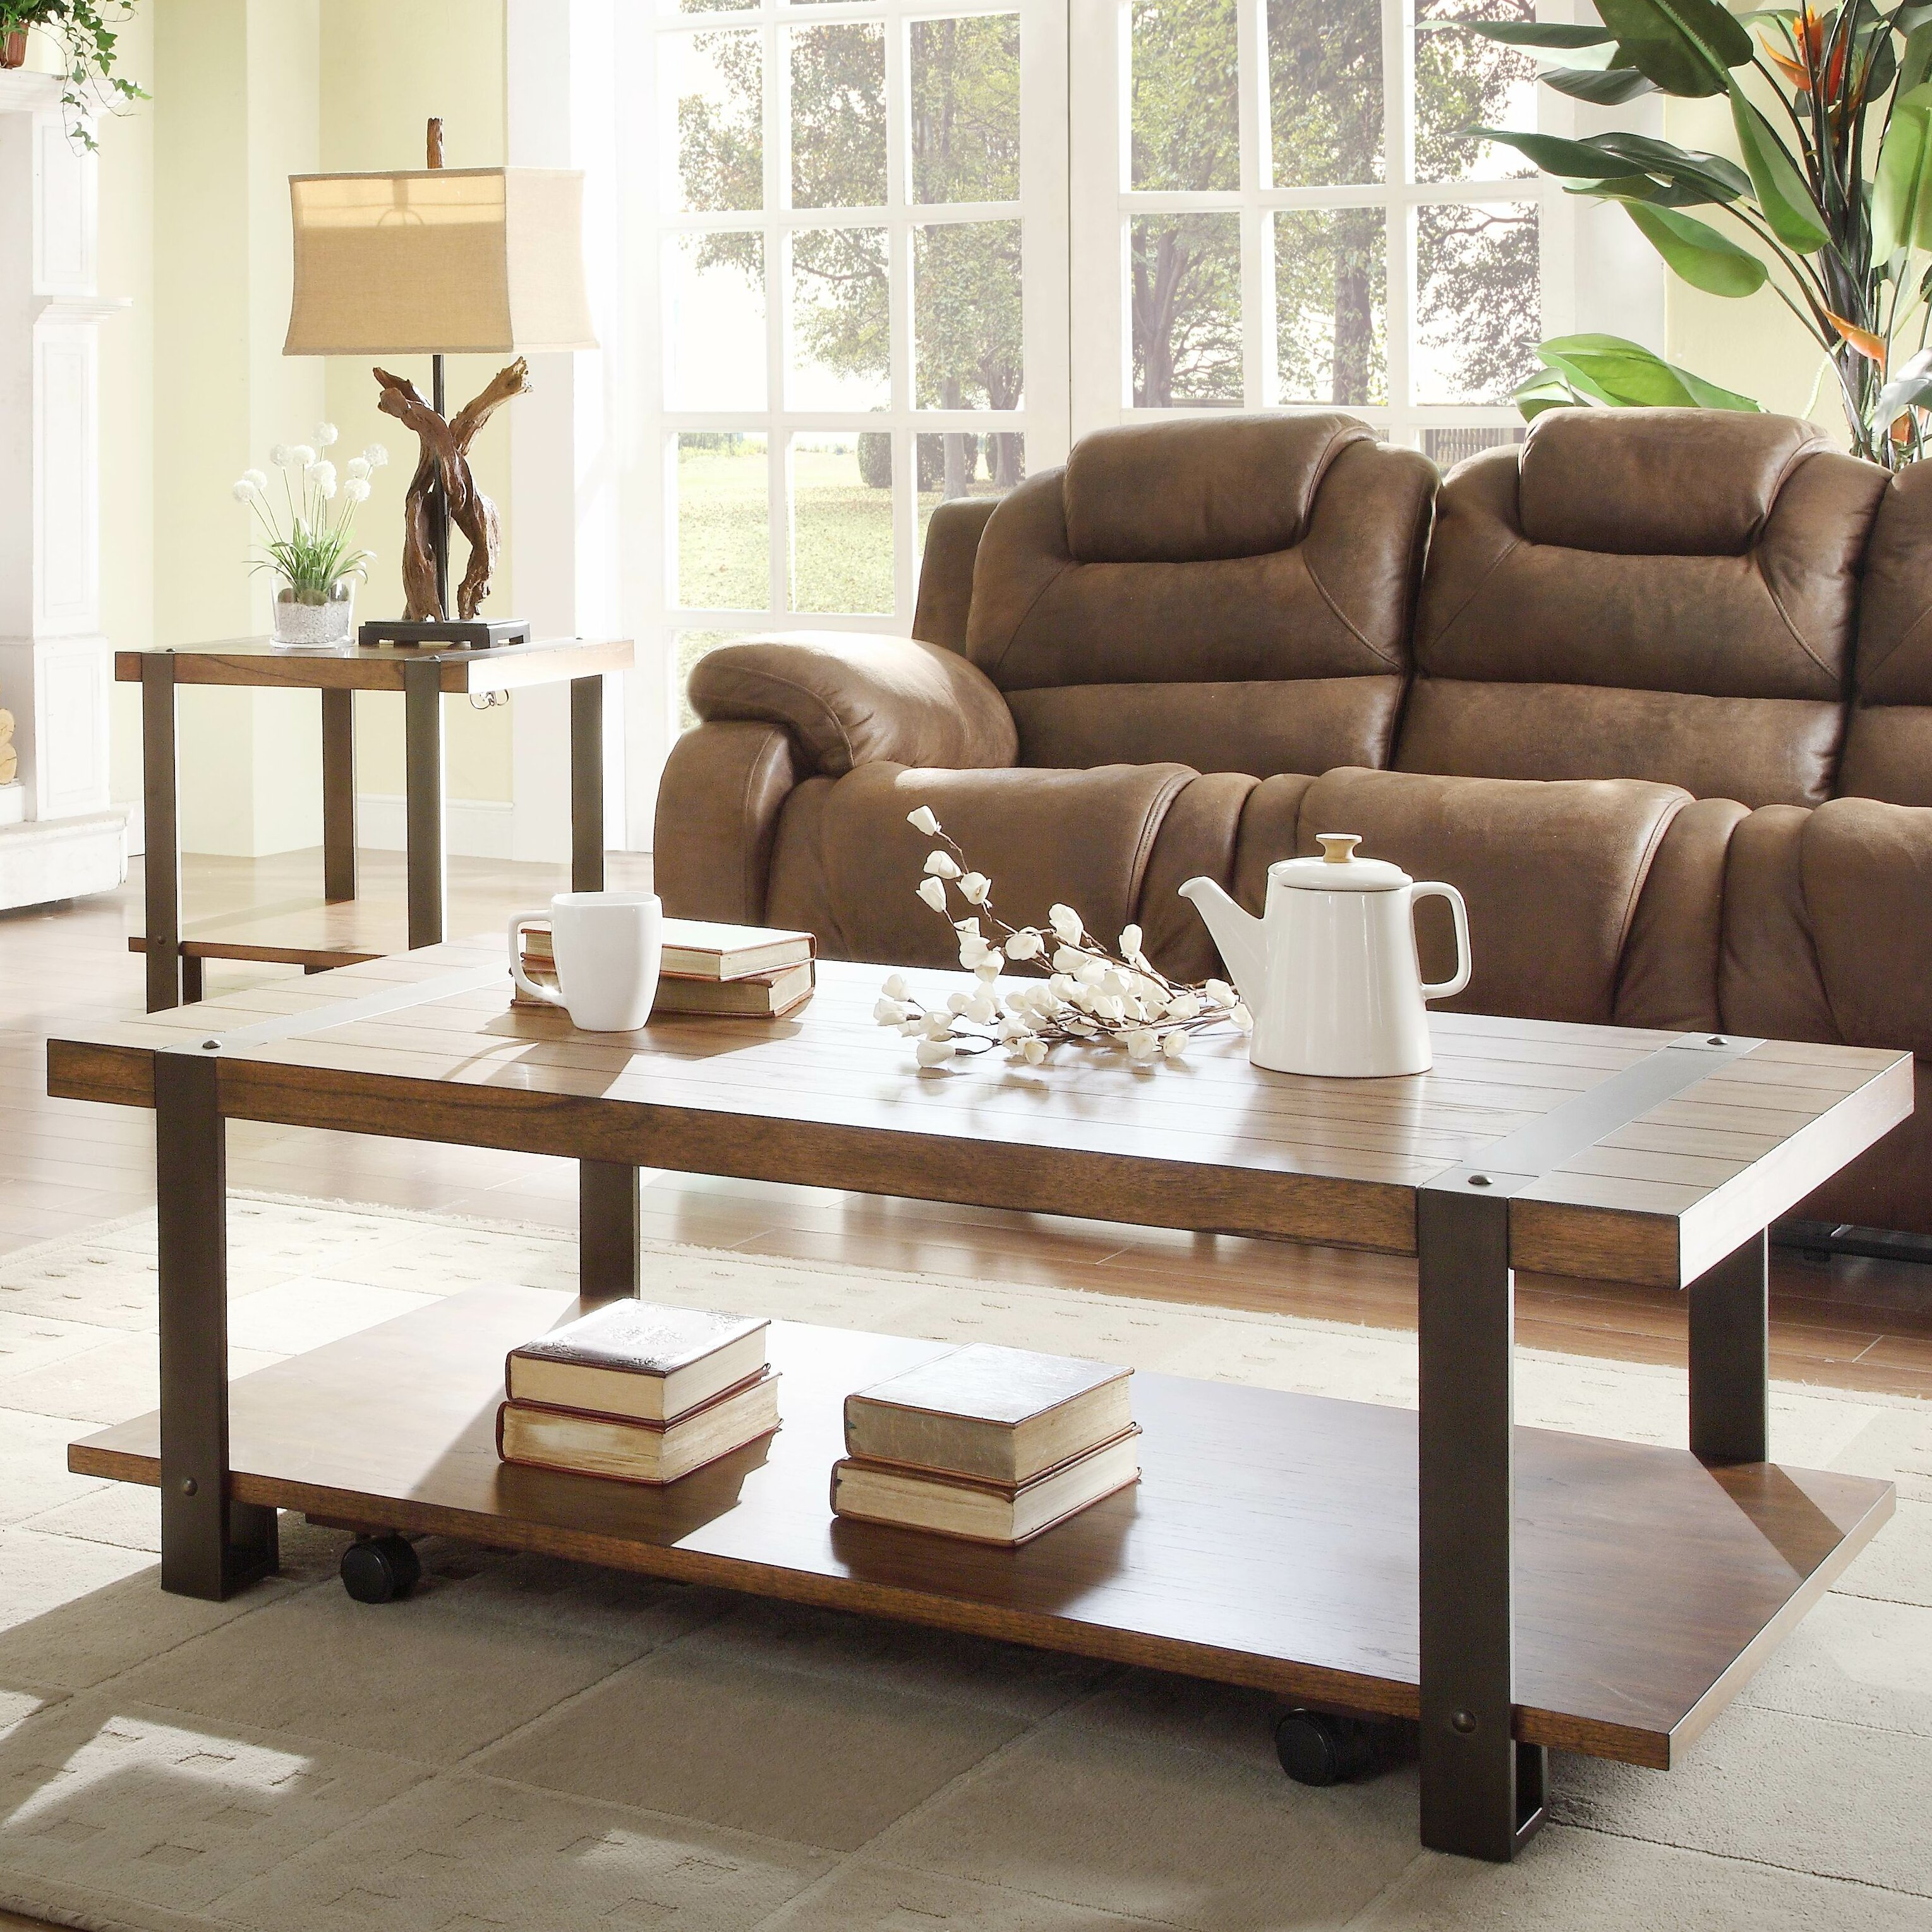 woodhaven hill northwood coffee table wayfair. Black Bedroom Furniture Sets. Home Design Ideas